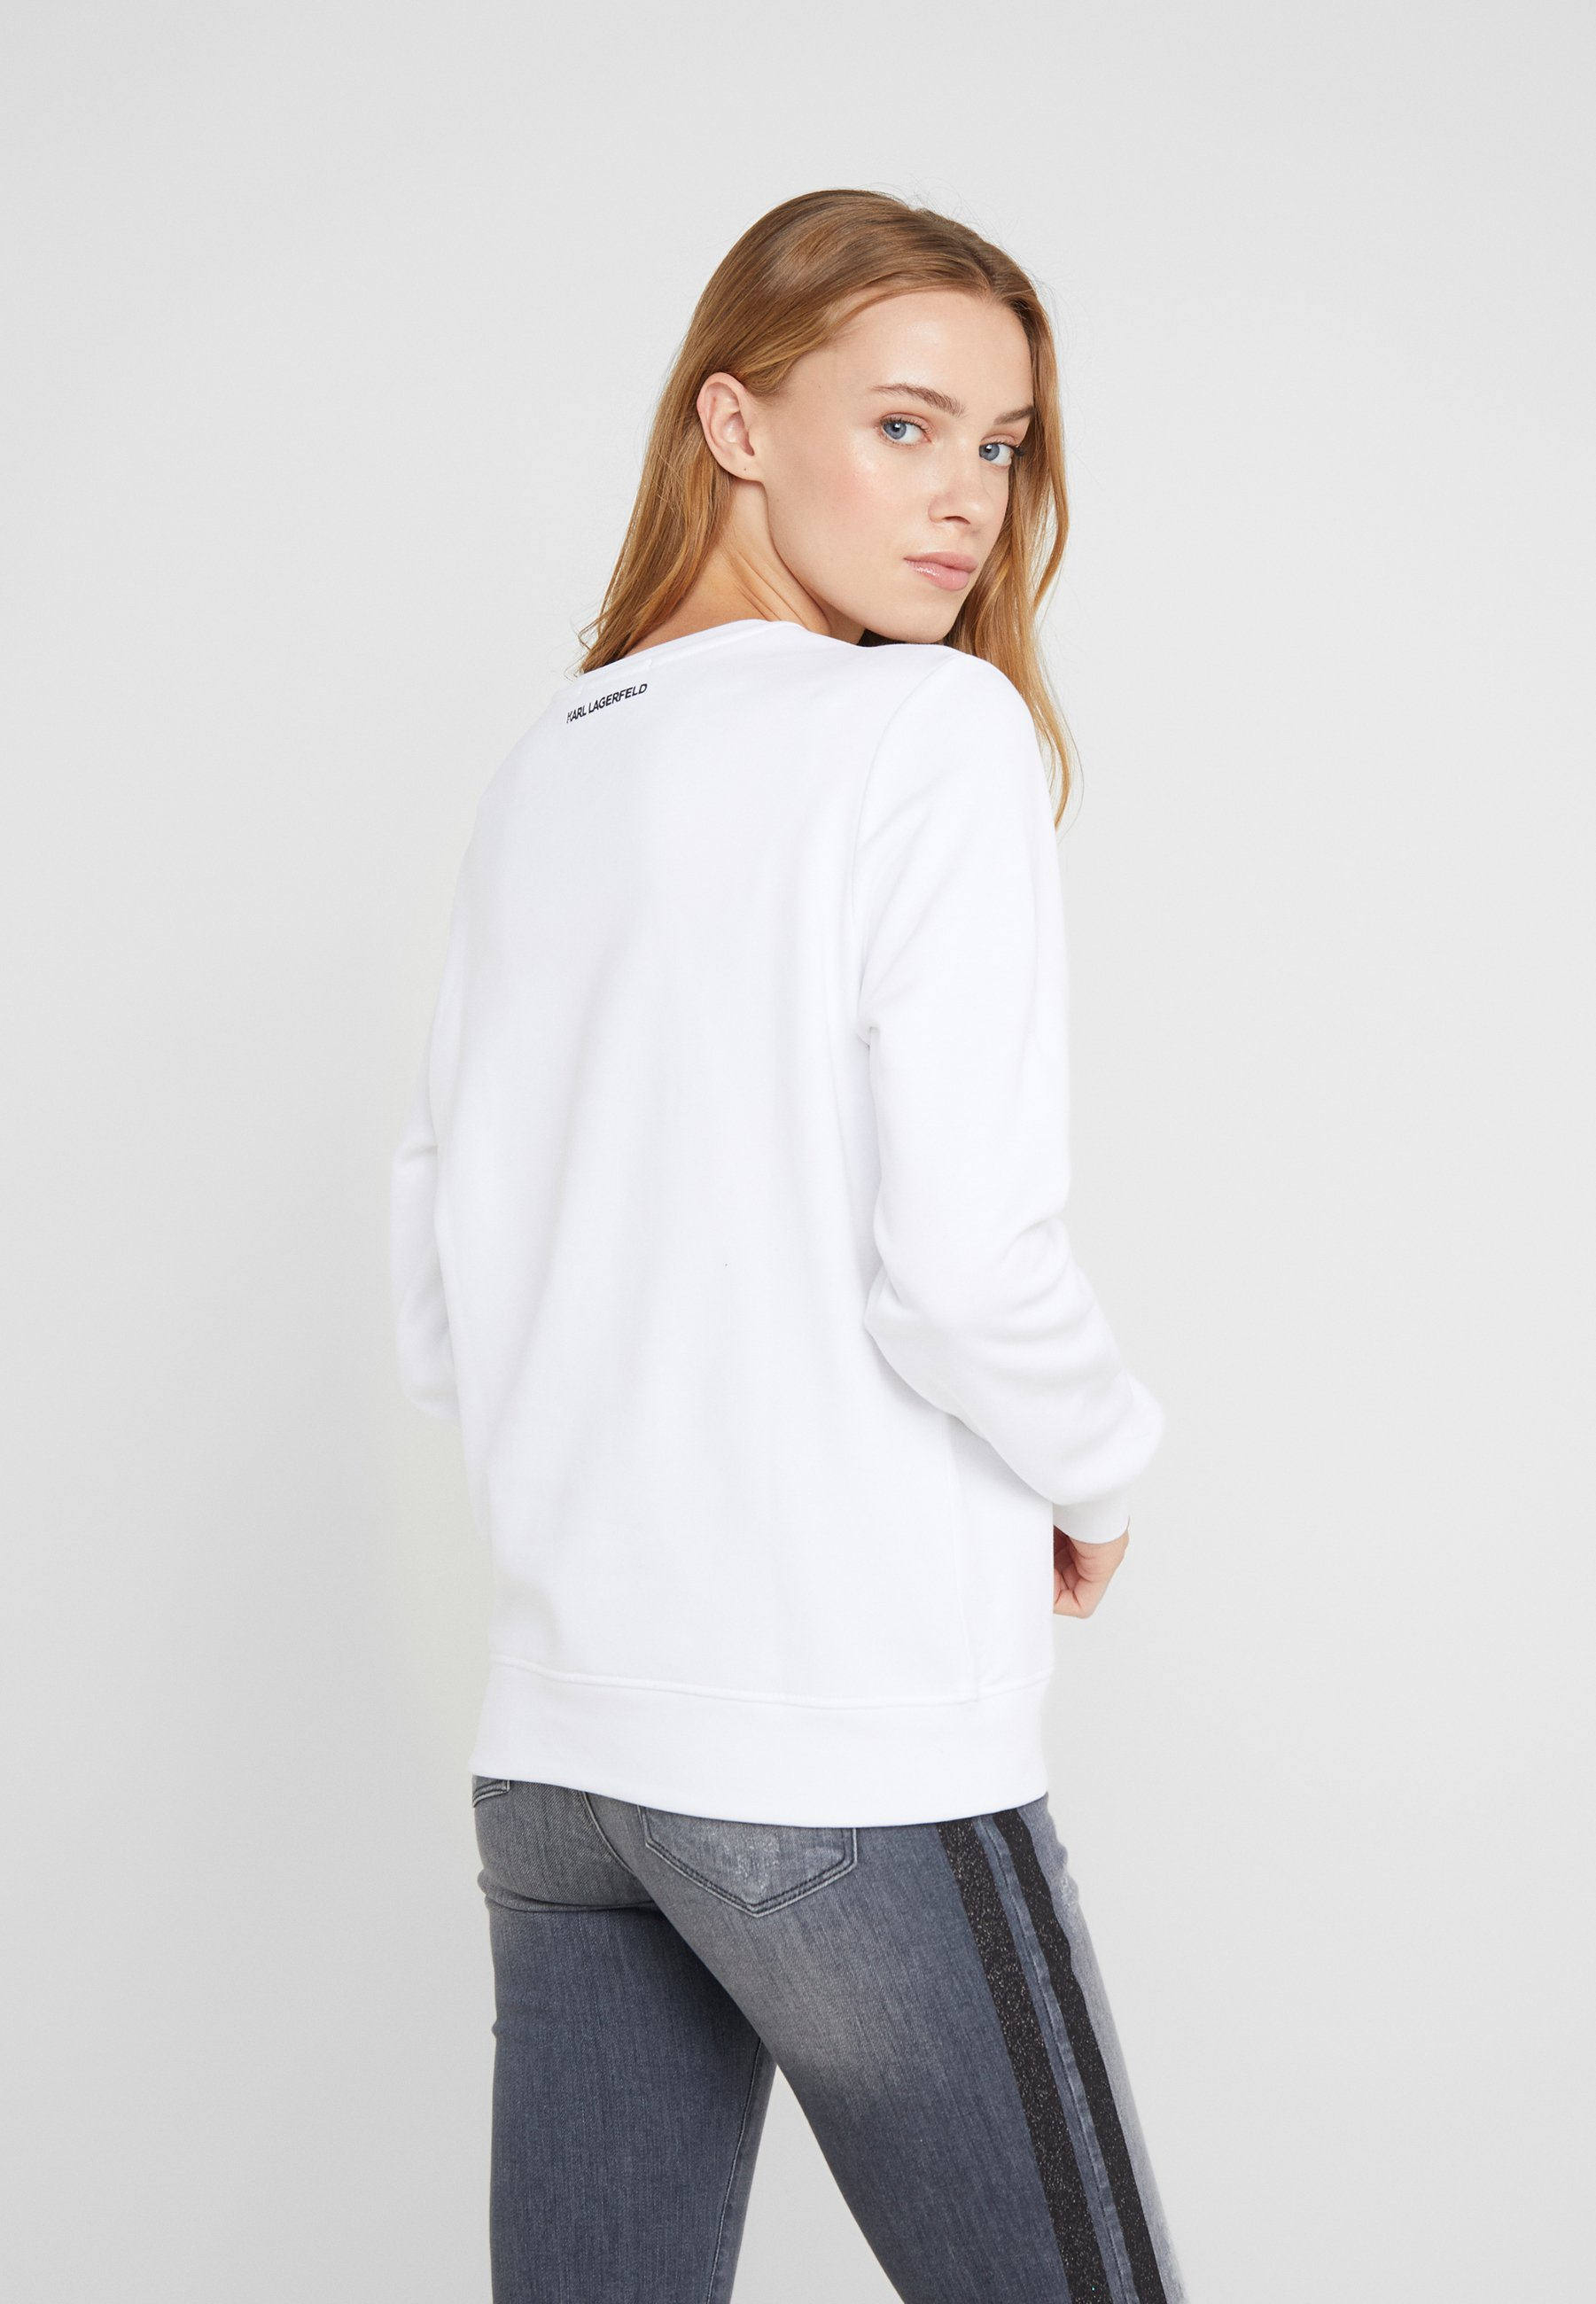 Karl Karl Lagerfeld Lagerfeld White Ikonik ChoupetteSweatshirt throdCQsxB